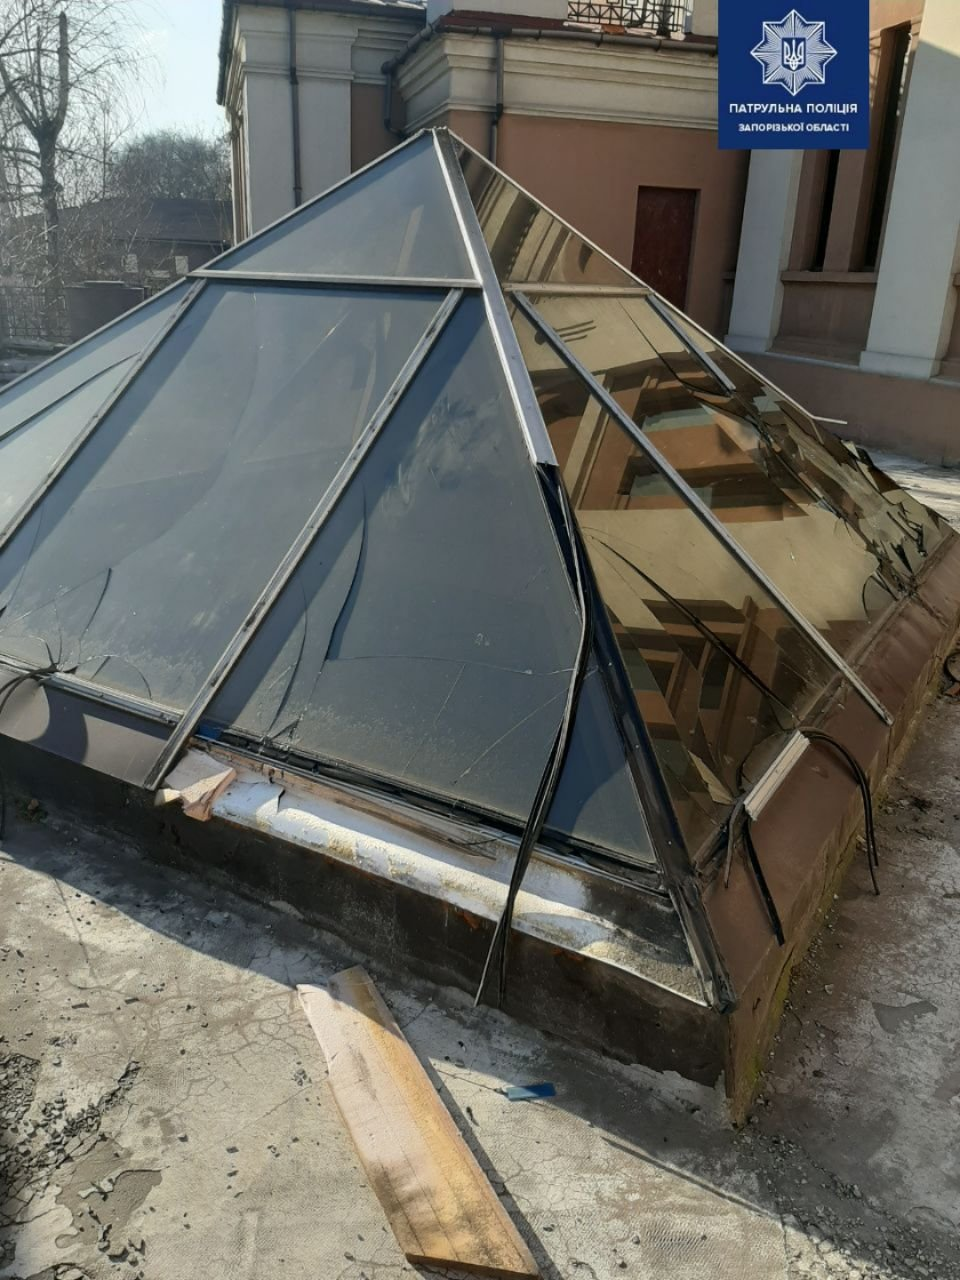 В Запорожье с купола фонтана украли металлические профили, - ФОТО, фото-2